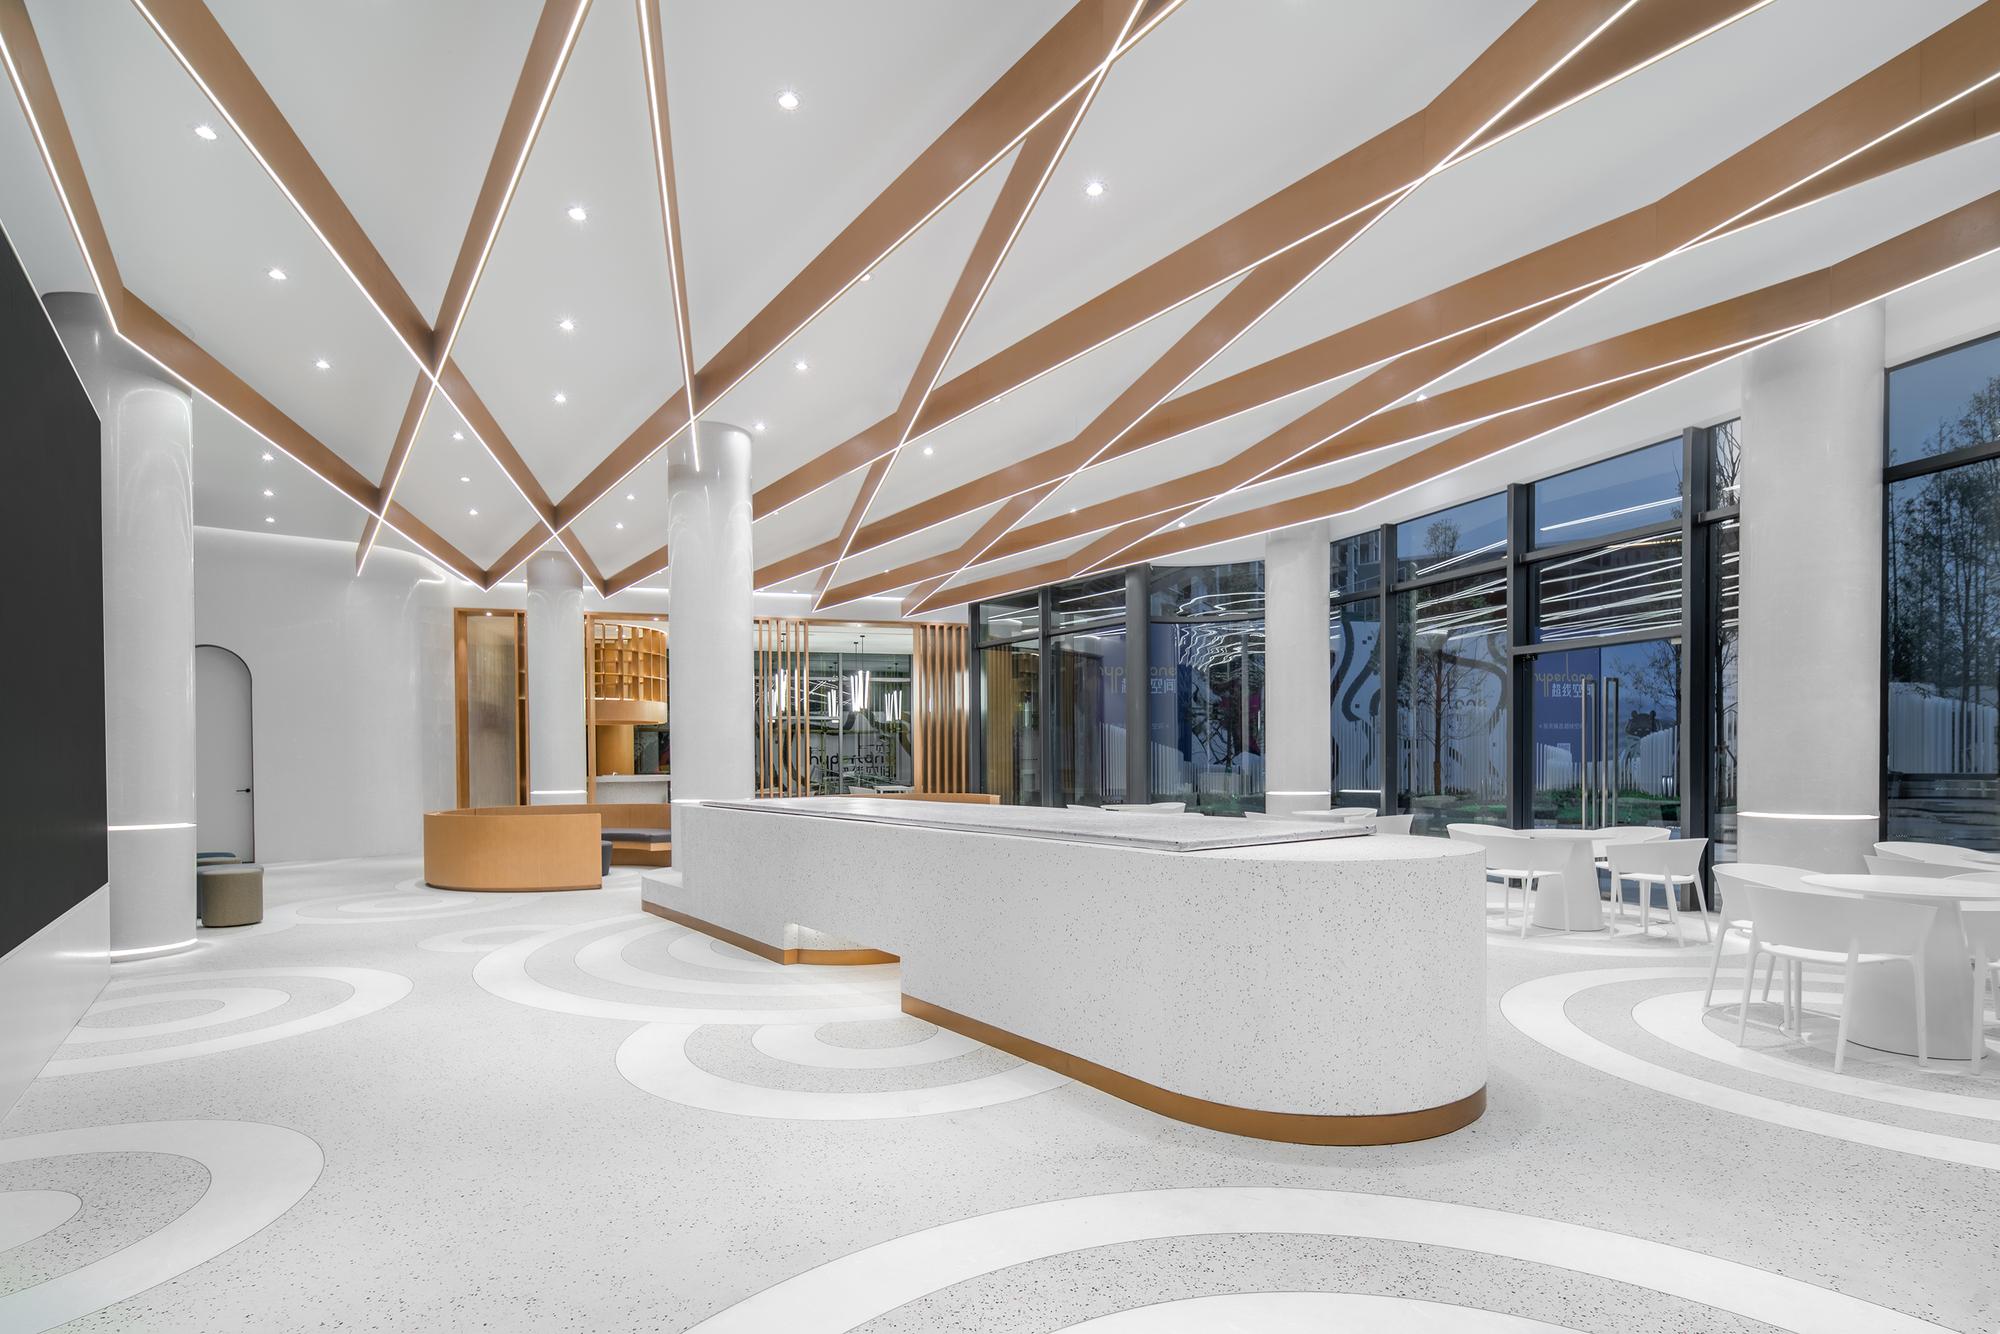 Reception Center of Chengdu Xindu Cultural Center / DAGA Architects